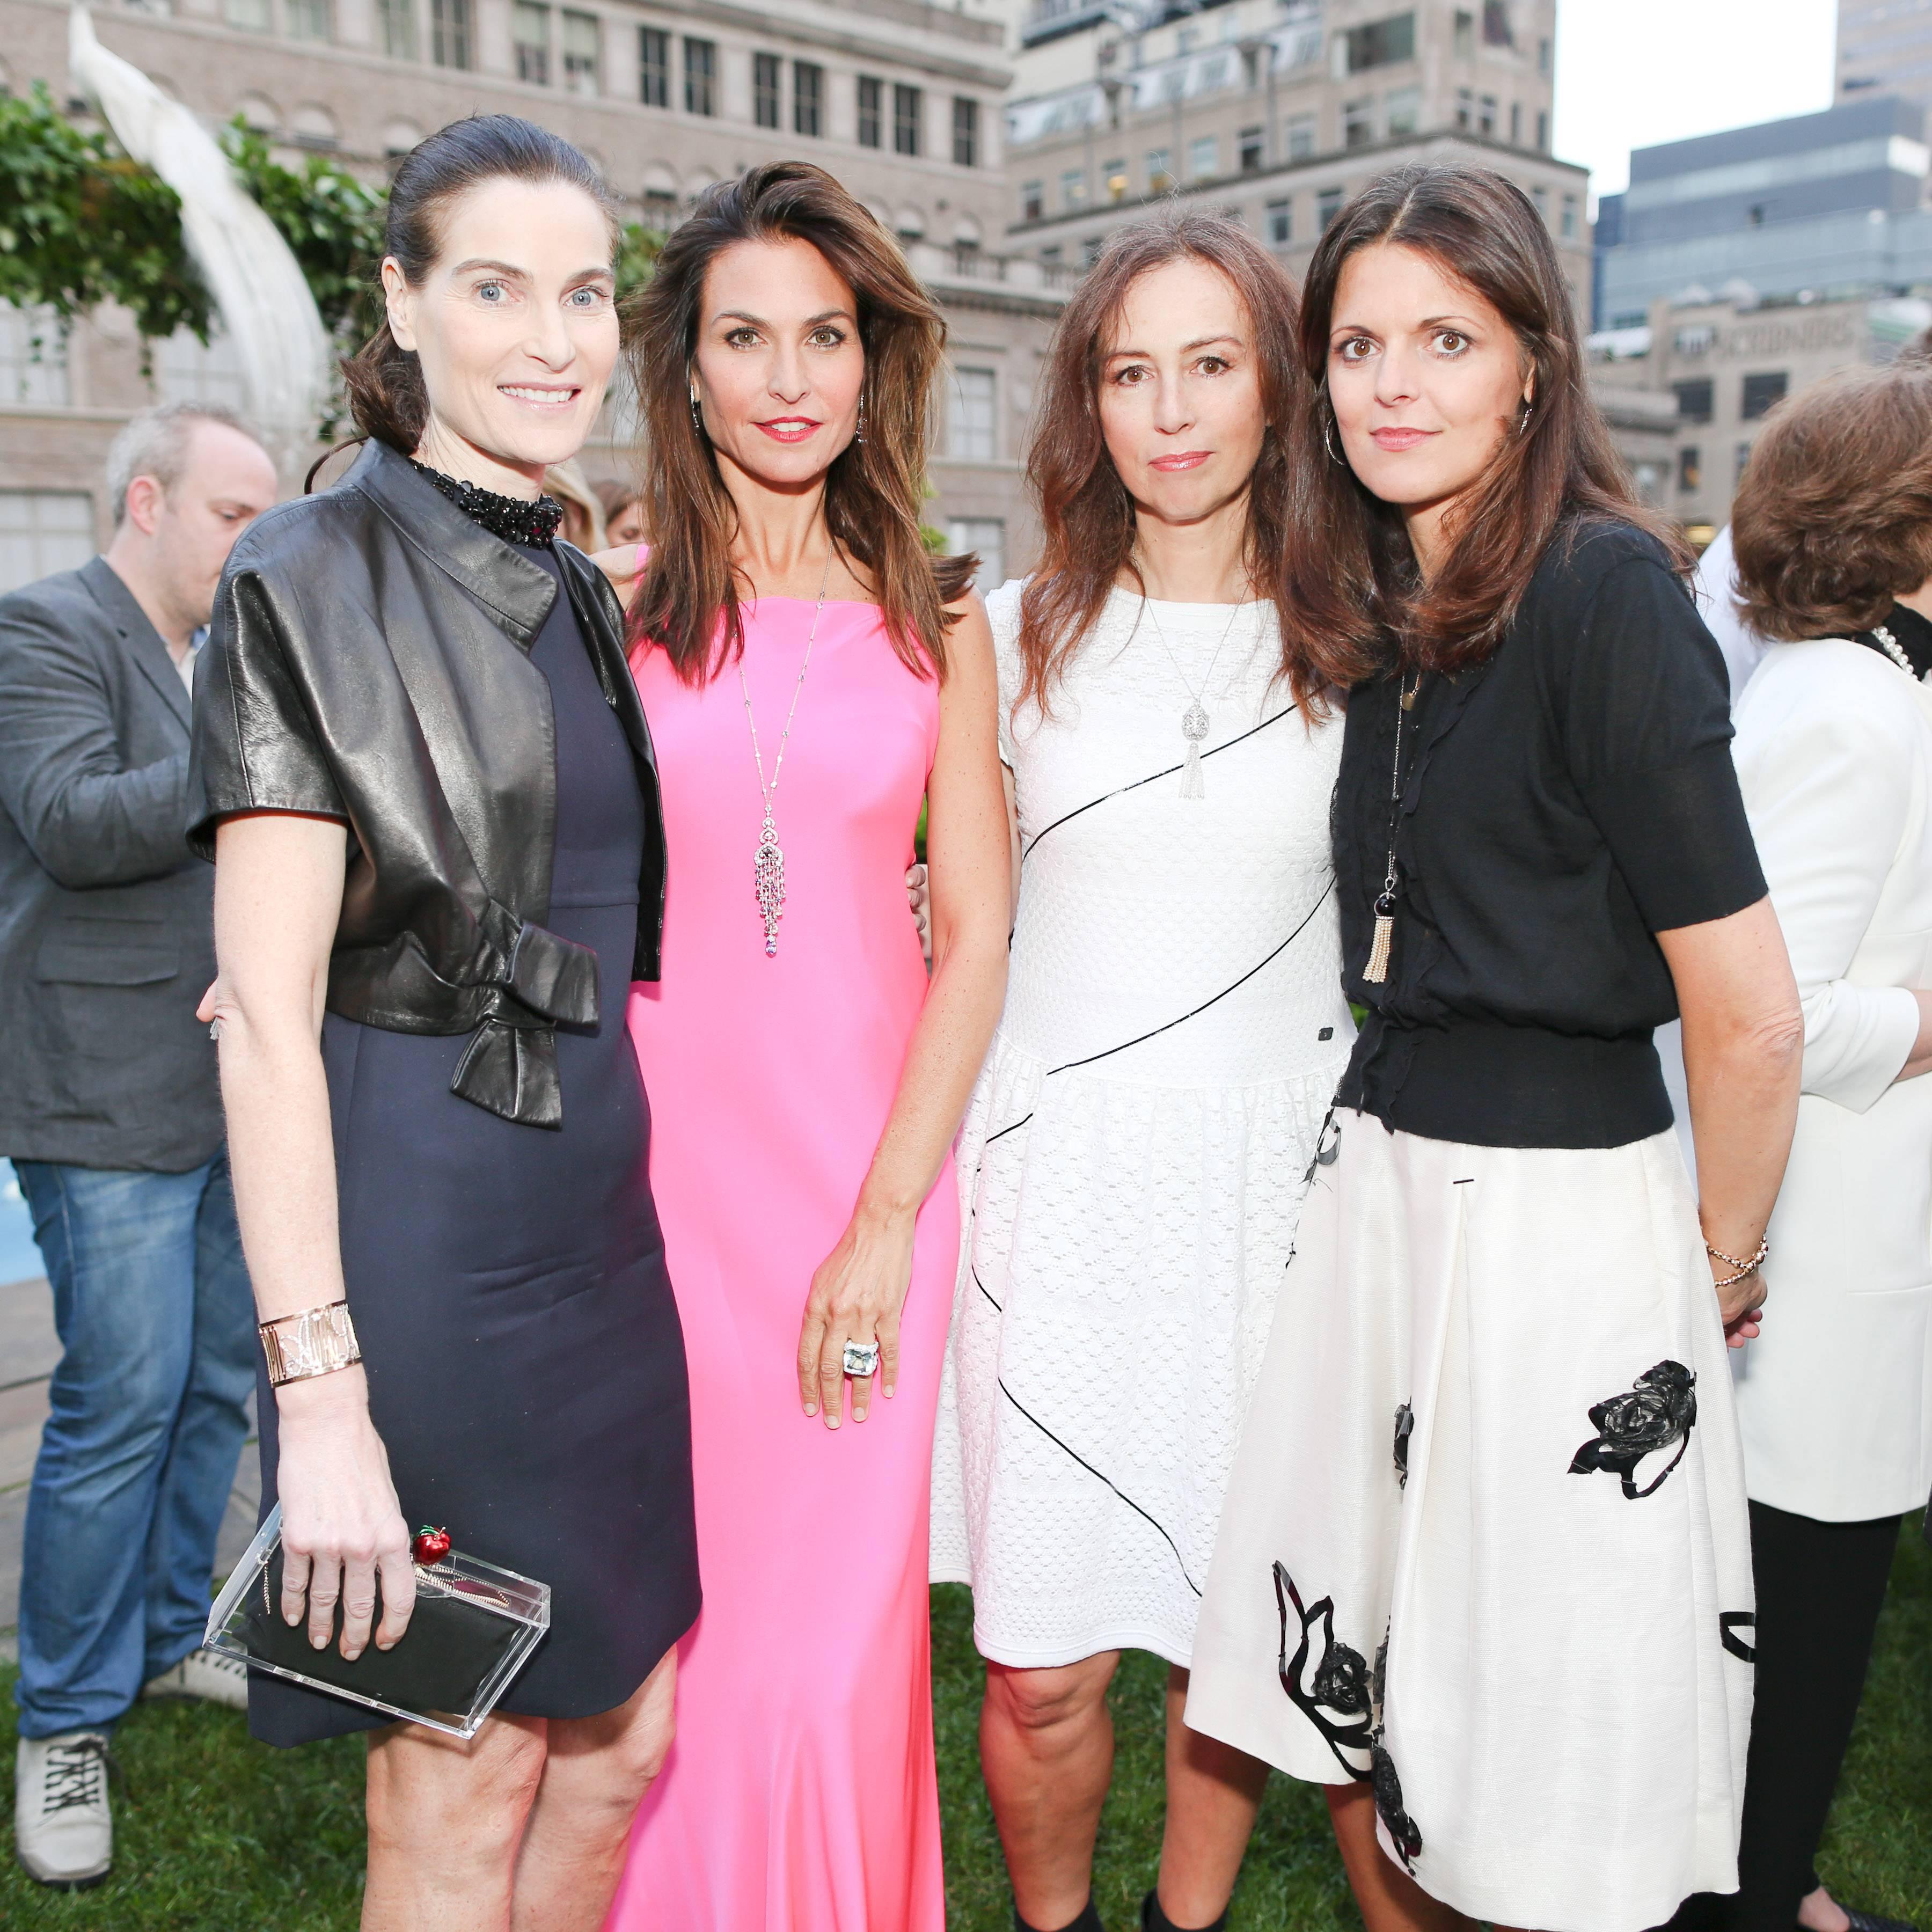 Jennifer Creel, Whitney Fairchild,  Katharina Flohr, Zoe Kimber